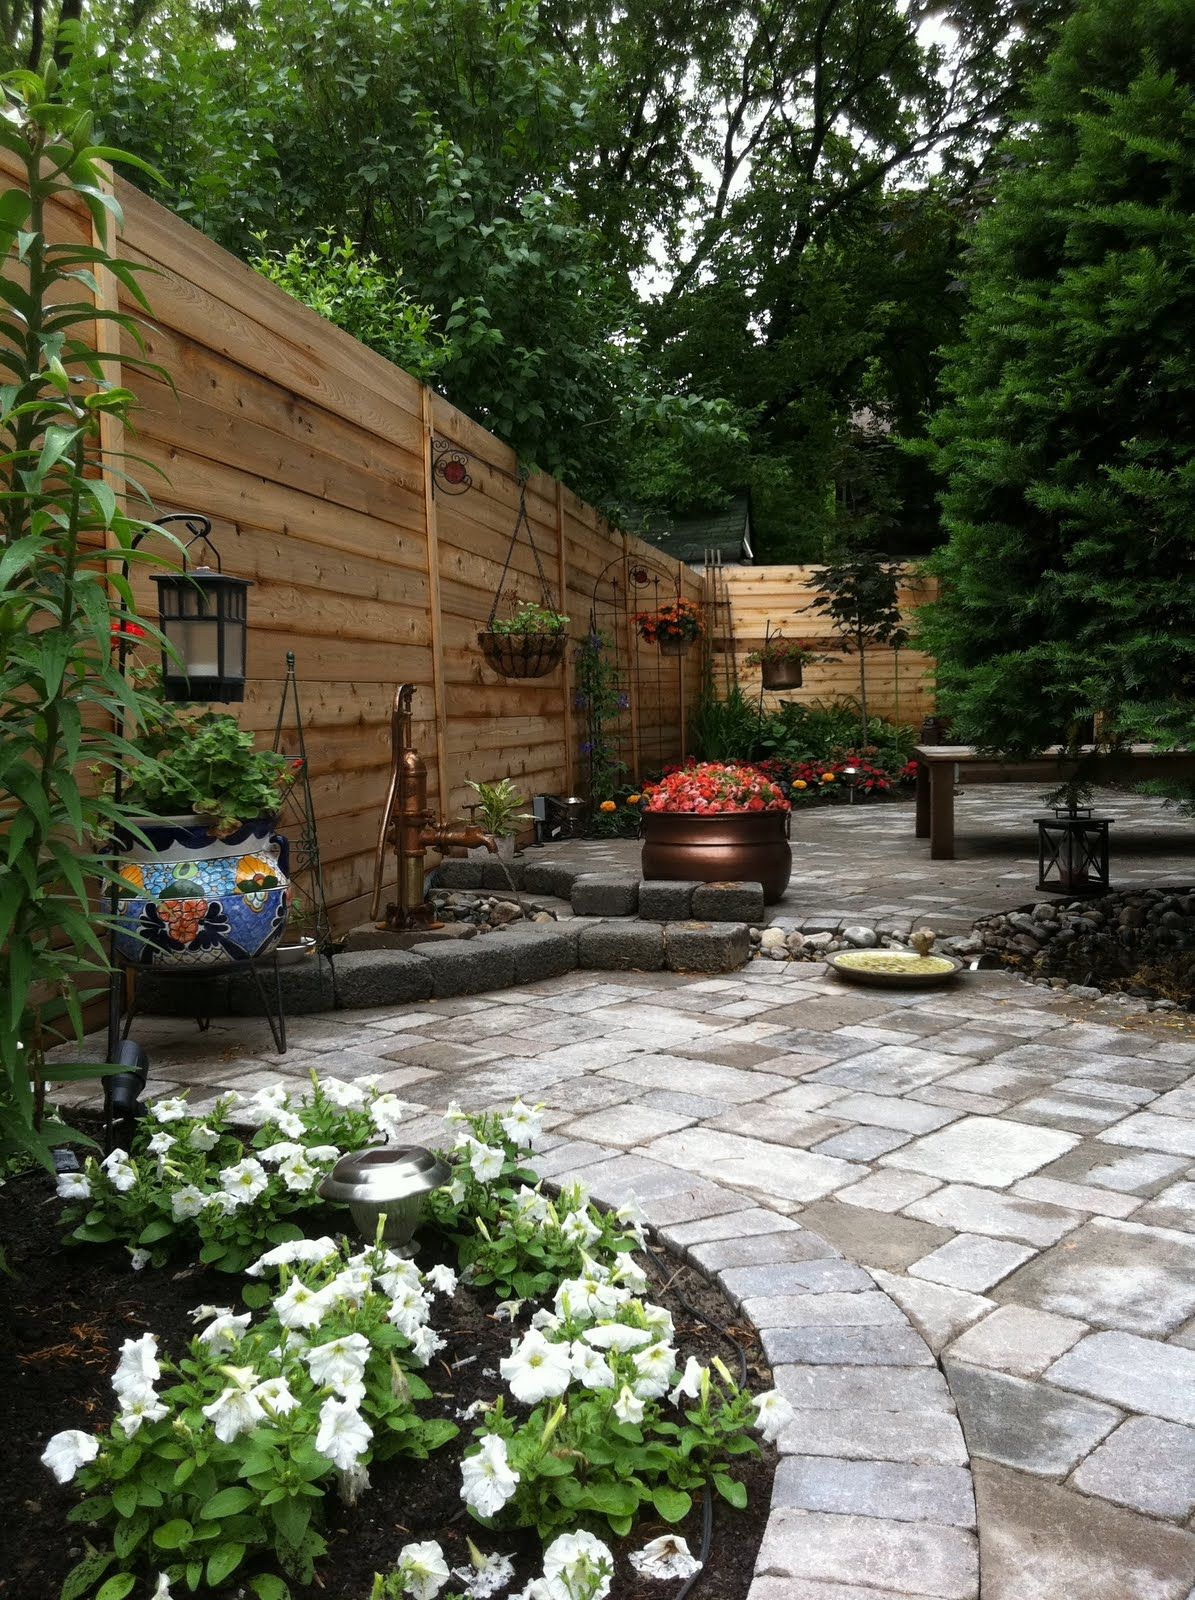 small / urban garden | Gardening & Landscaping | Pinterest on Small Urban Patio Ideas id=70247